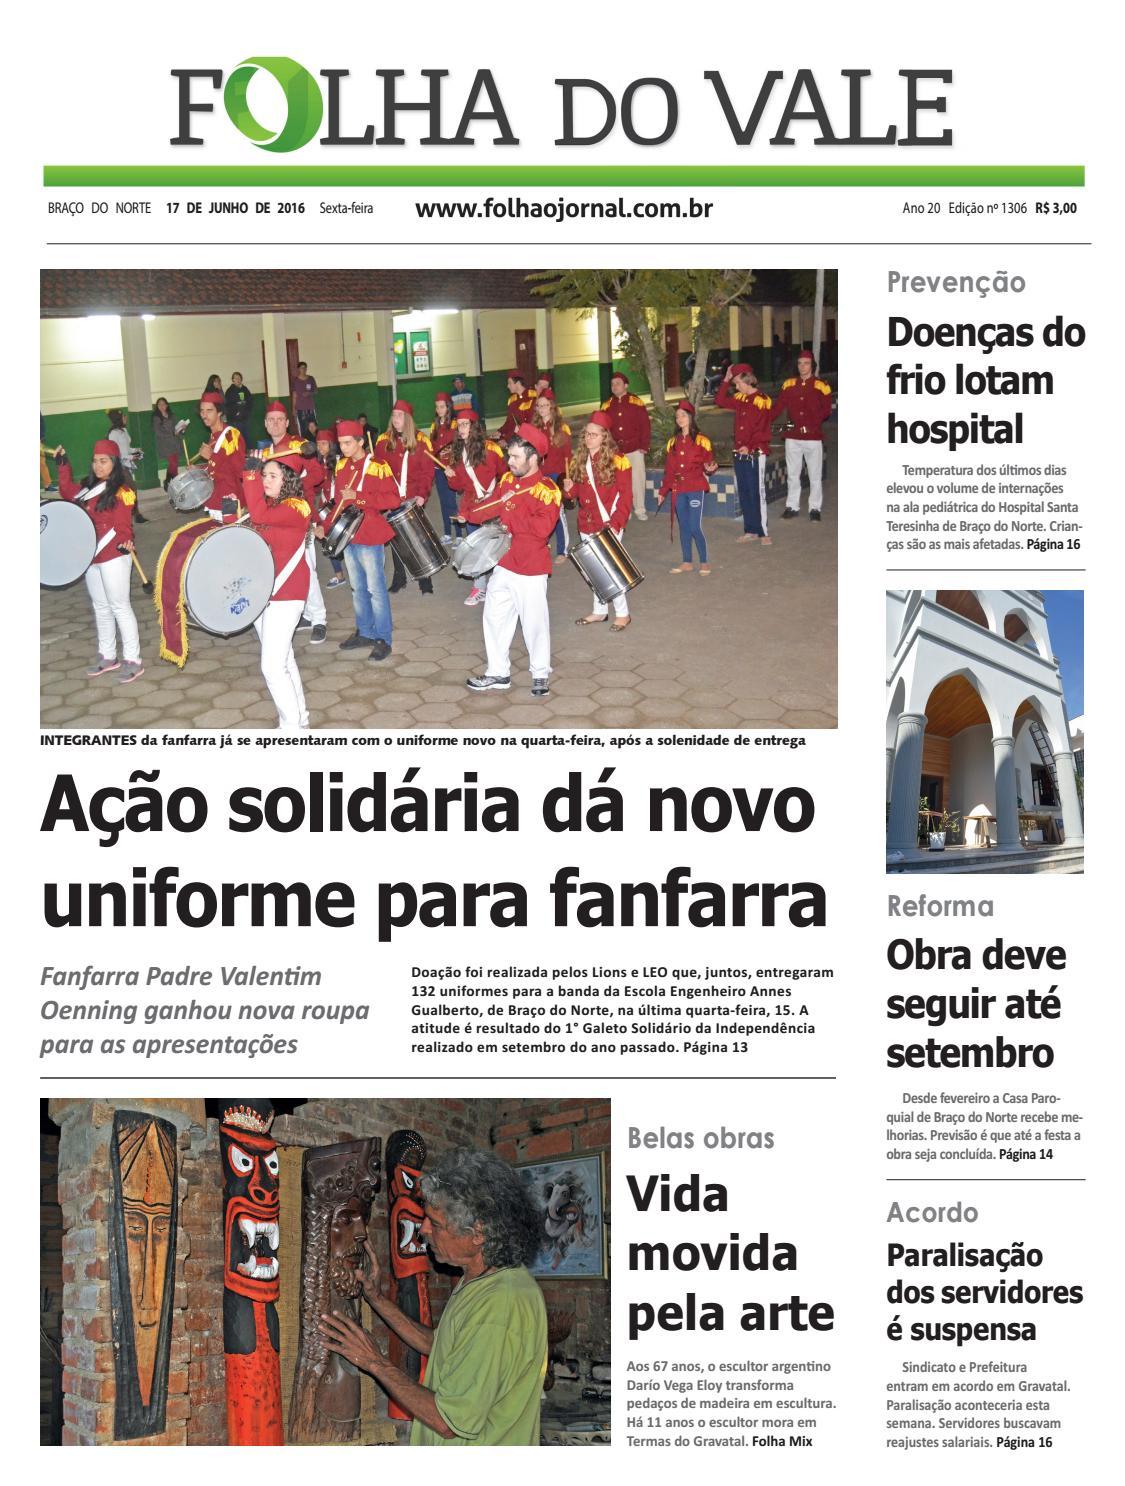 9c9de600f5 Sd4s5d4s5d4sd564sd45sd4 by Folha do Vale - issuu